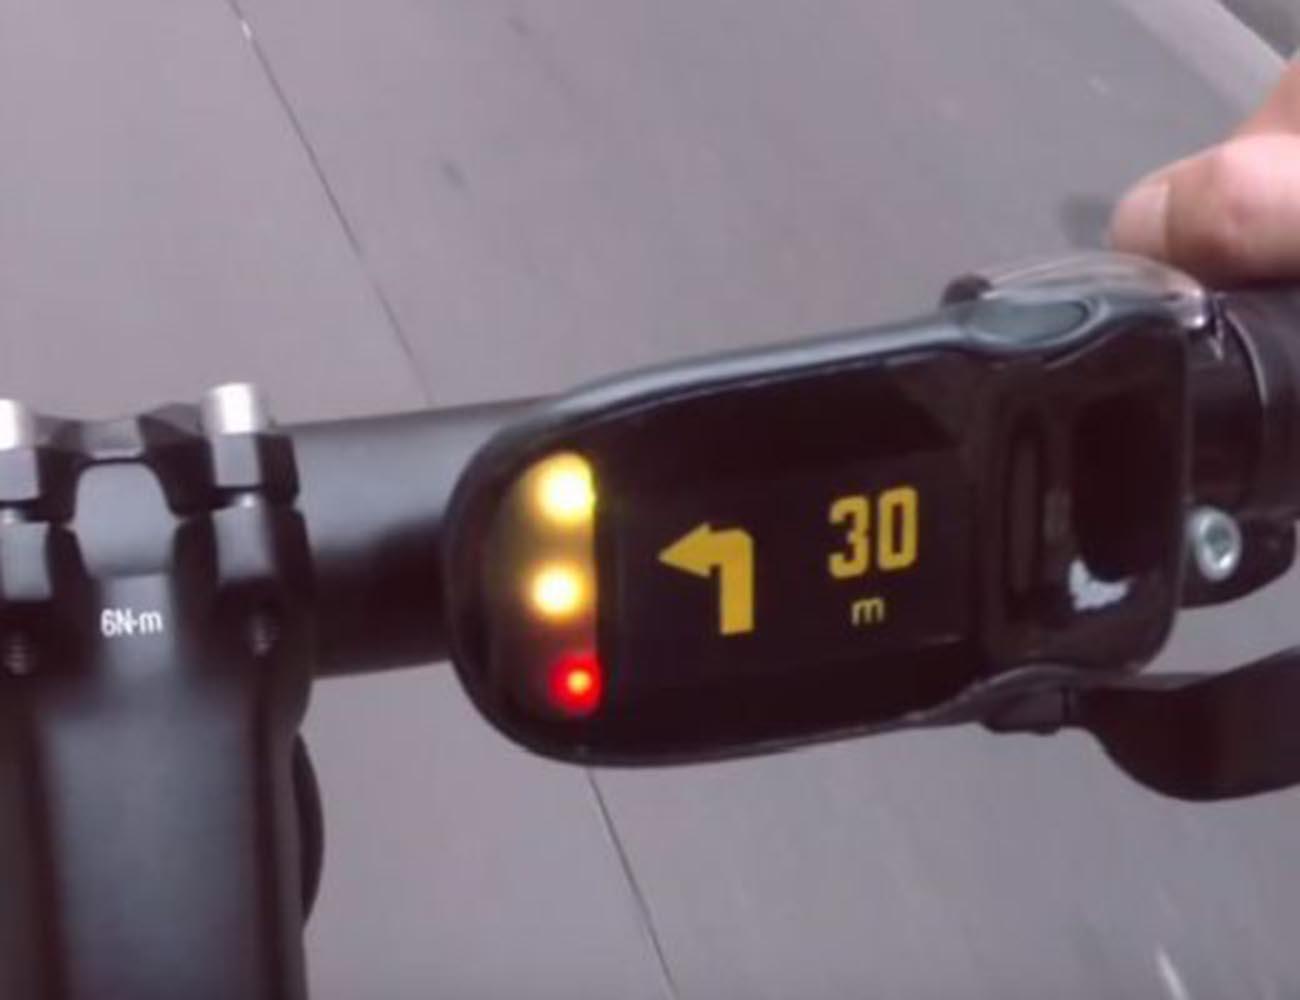 HAIKU – The Bike Assistant For Smart Urban Cyclists